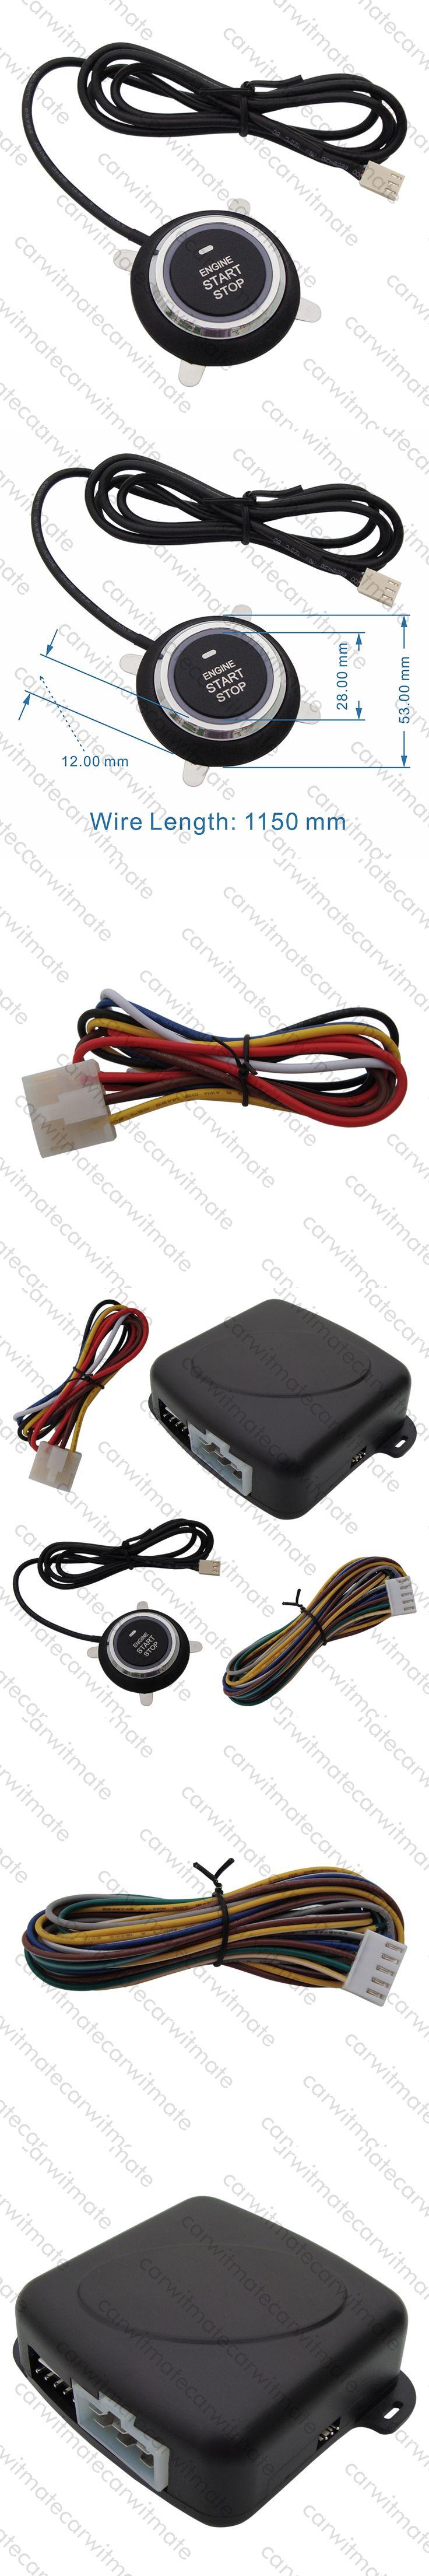 Universal Car Engine Start Stop System Push Button Start Stop Original Car Key Remote Start 10 Minutes Countdown Stop Car